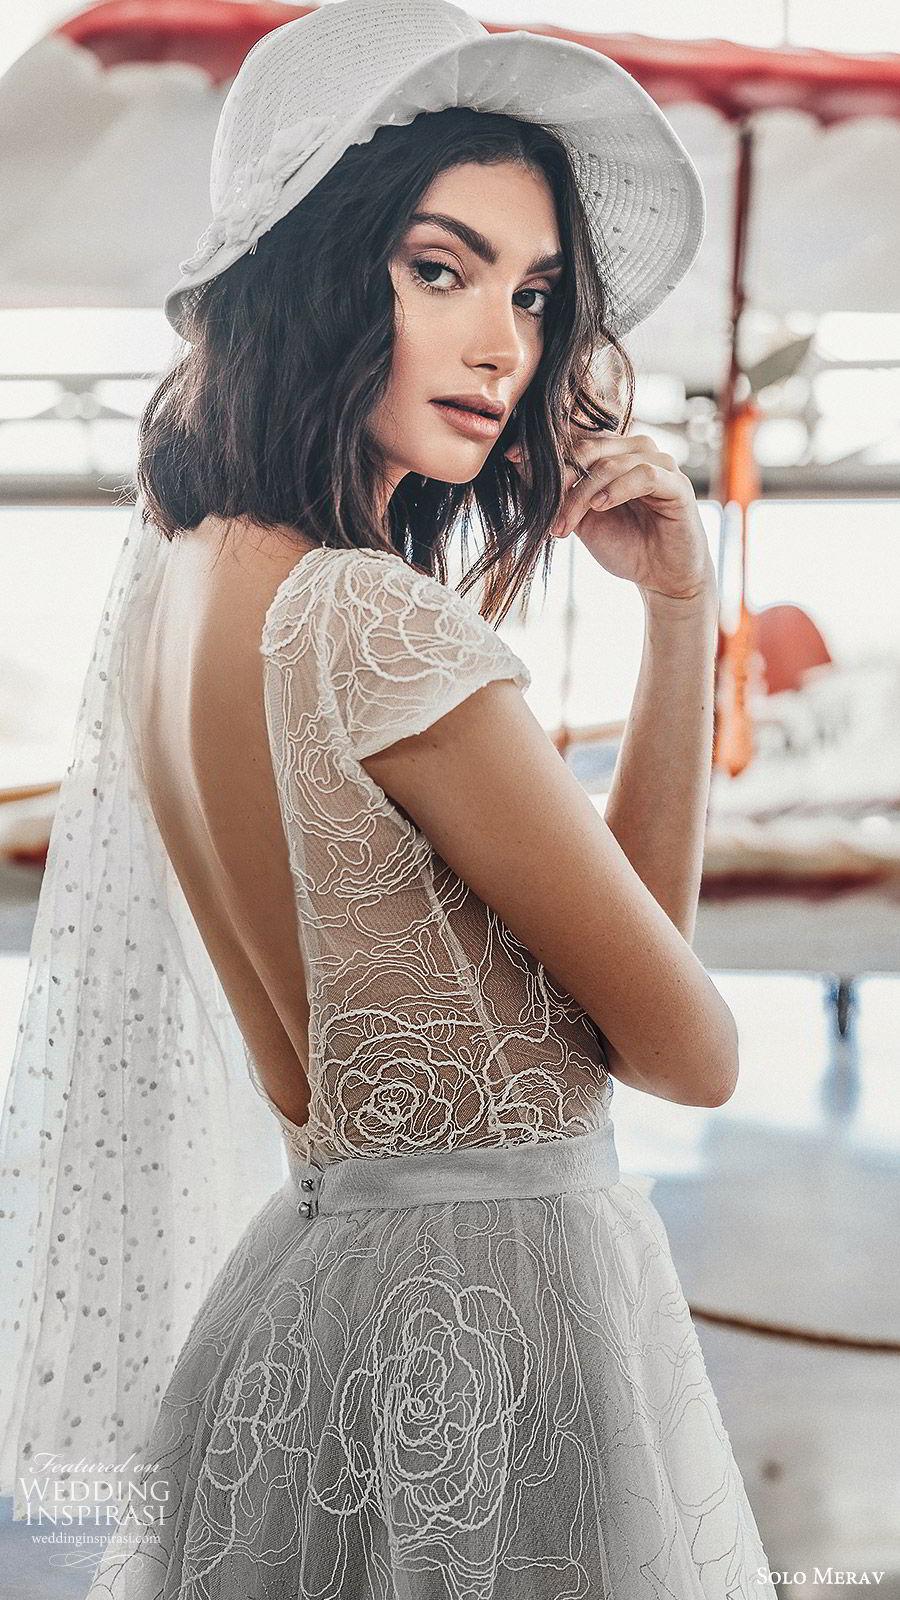 solo merav 2019 bridal cap sleeves jewel neckline sheer bodice embroidered a line tea length short wedding dress (10) bv low back vintage romantic